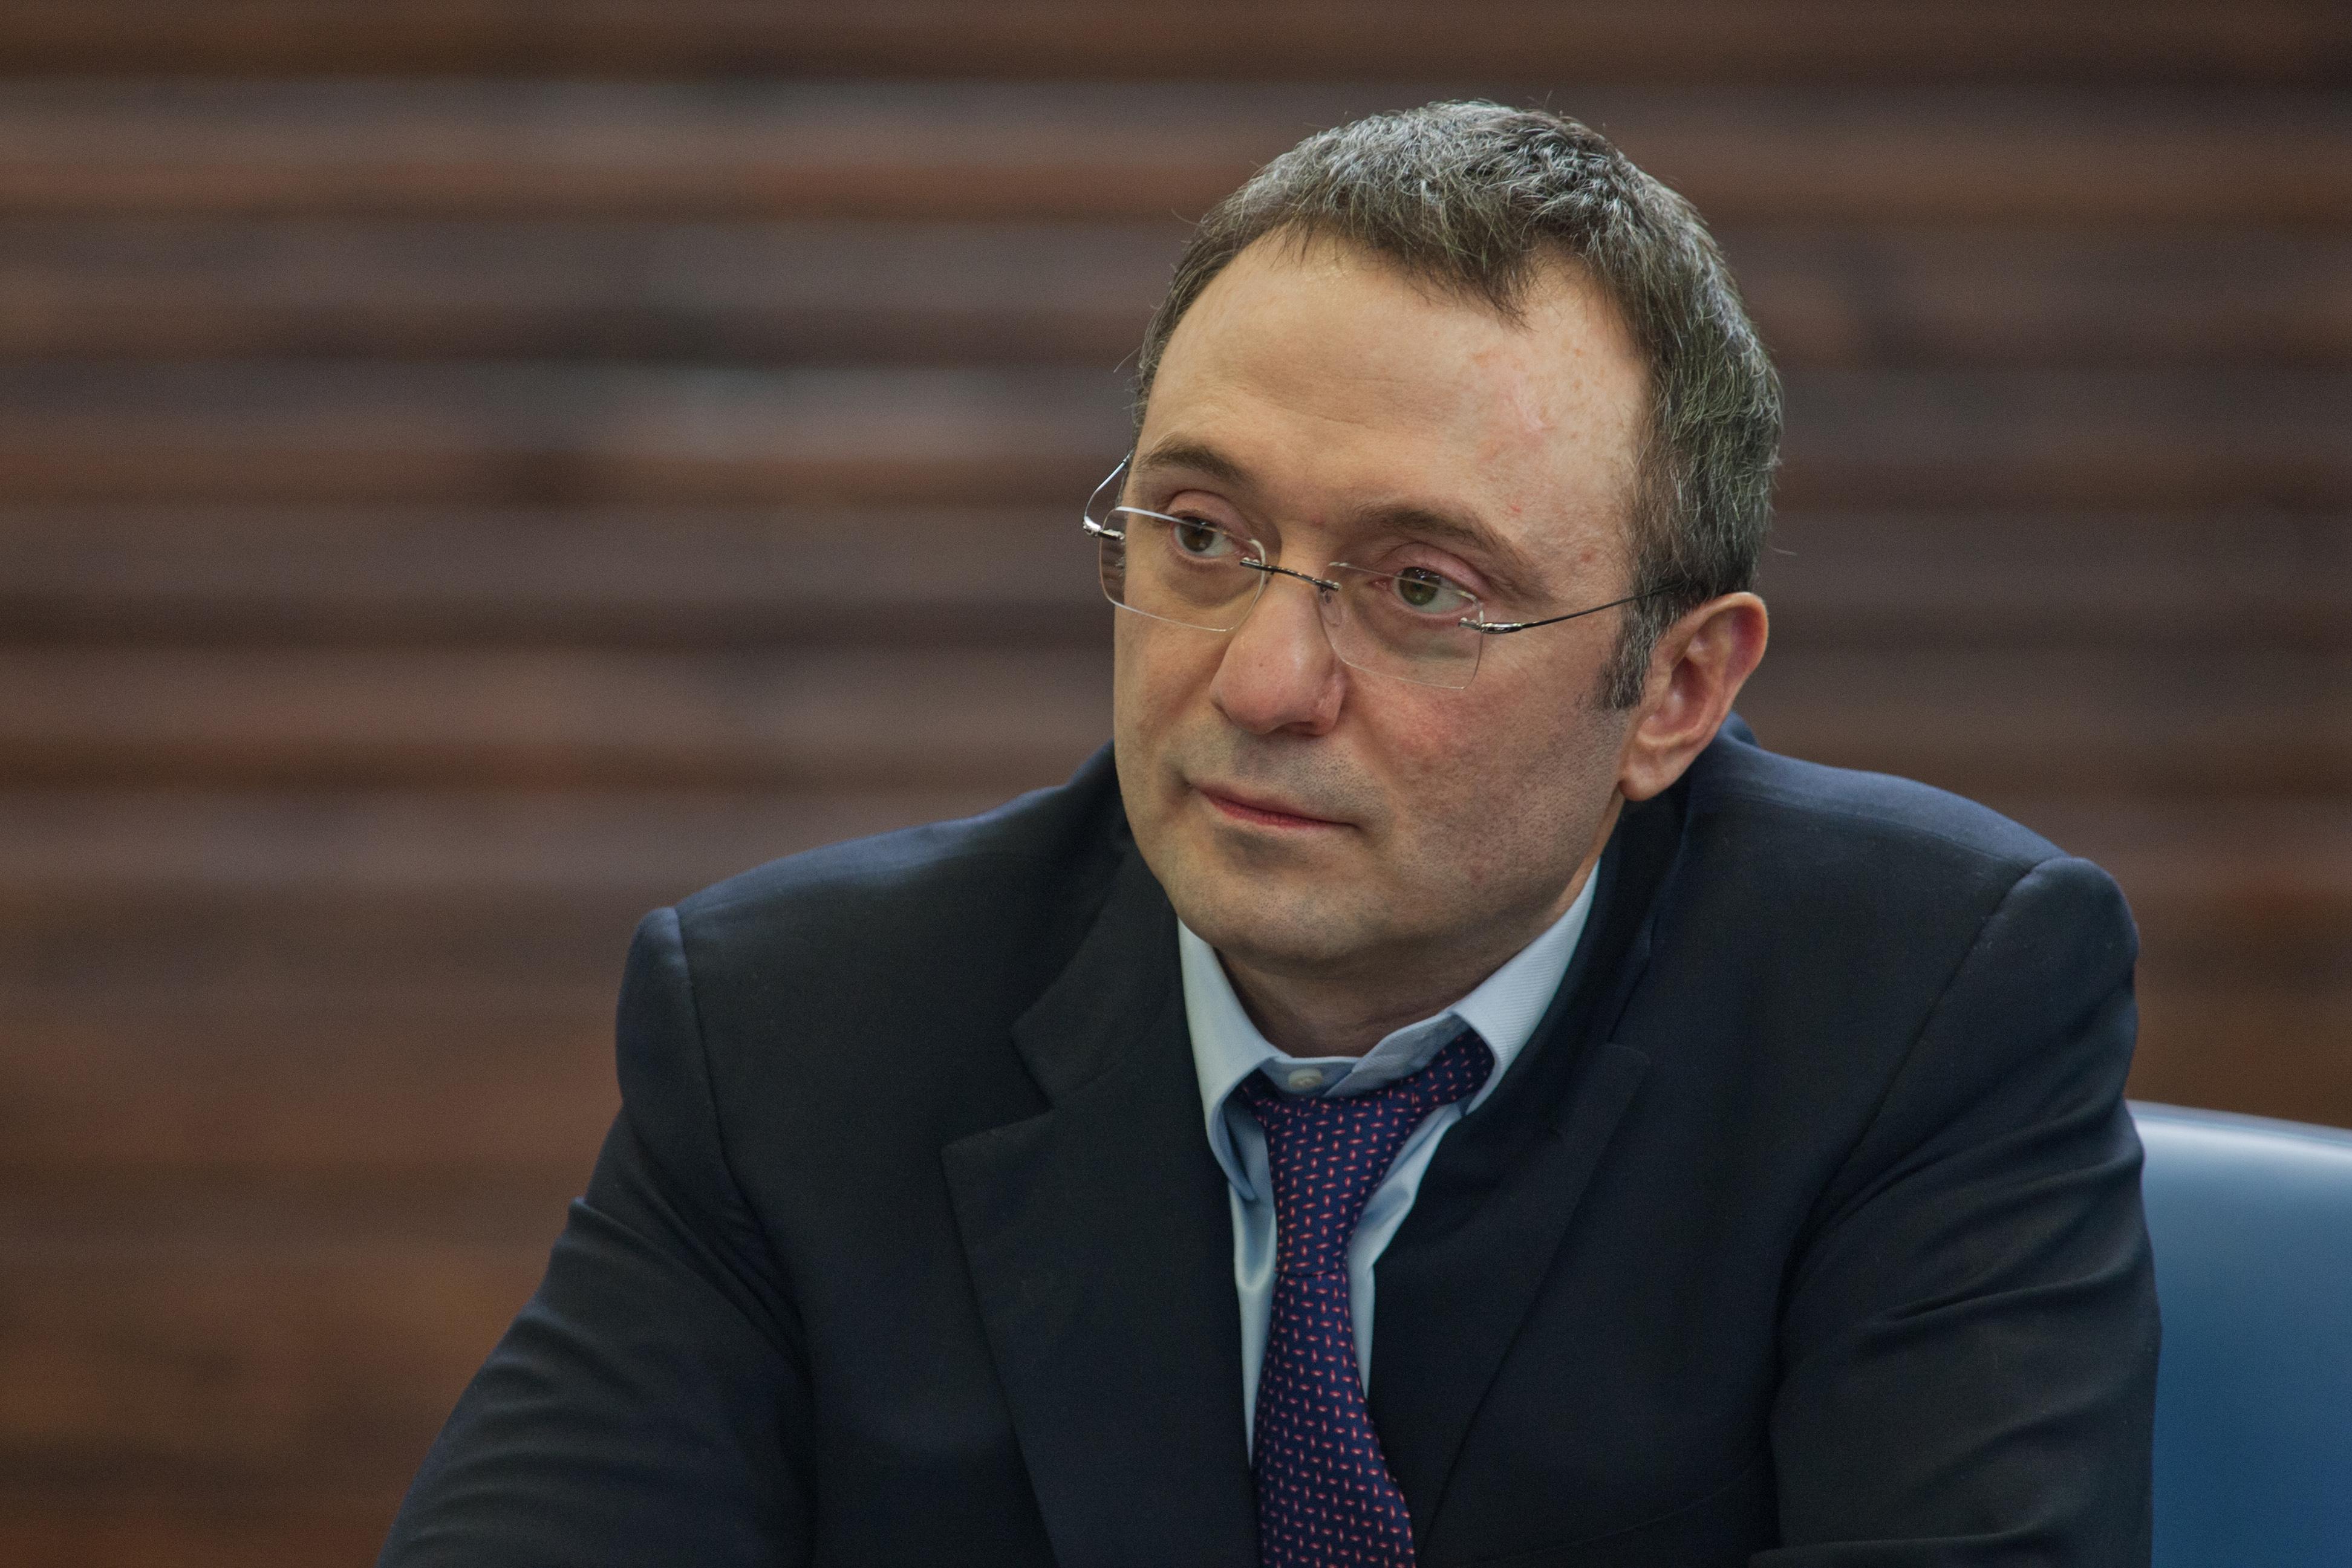 Prokhorov bought a share of Kerimov in Uralkali 20